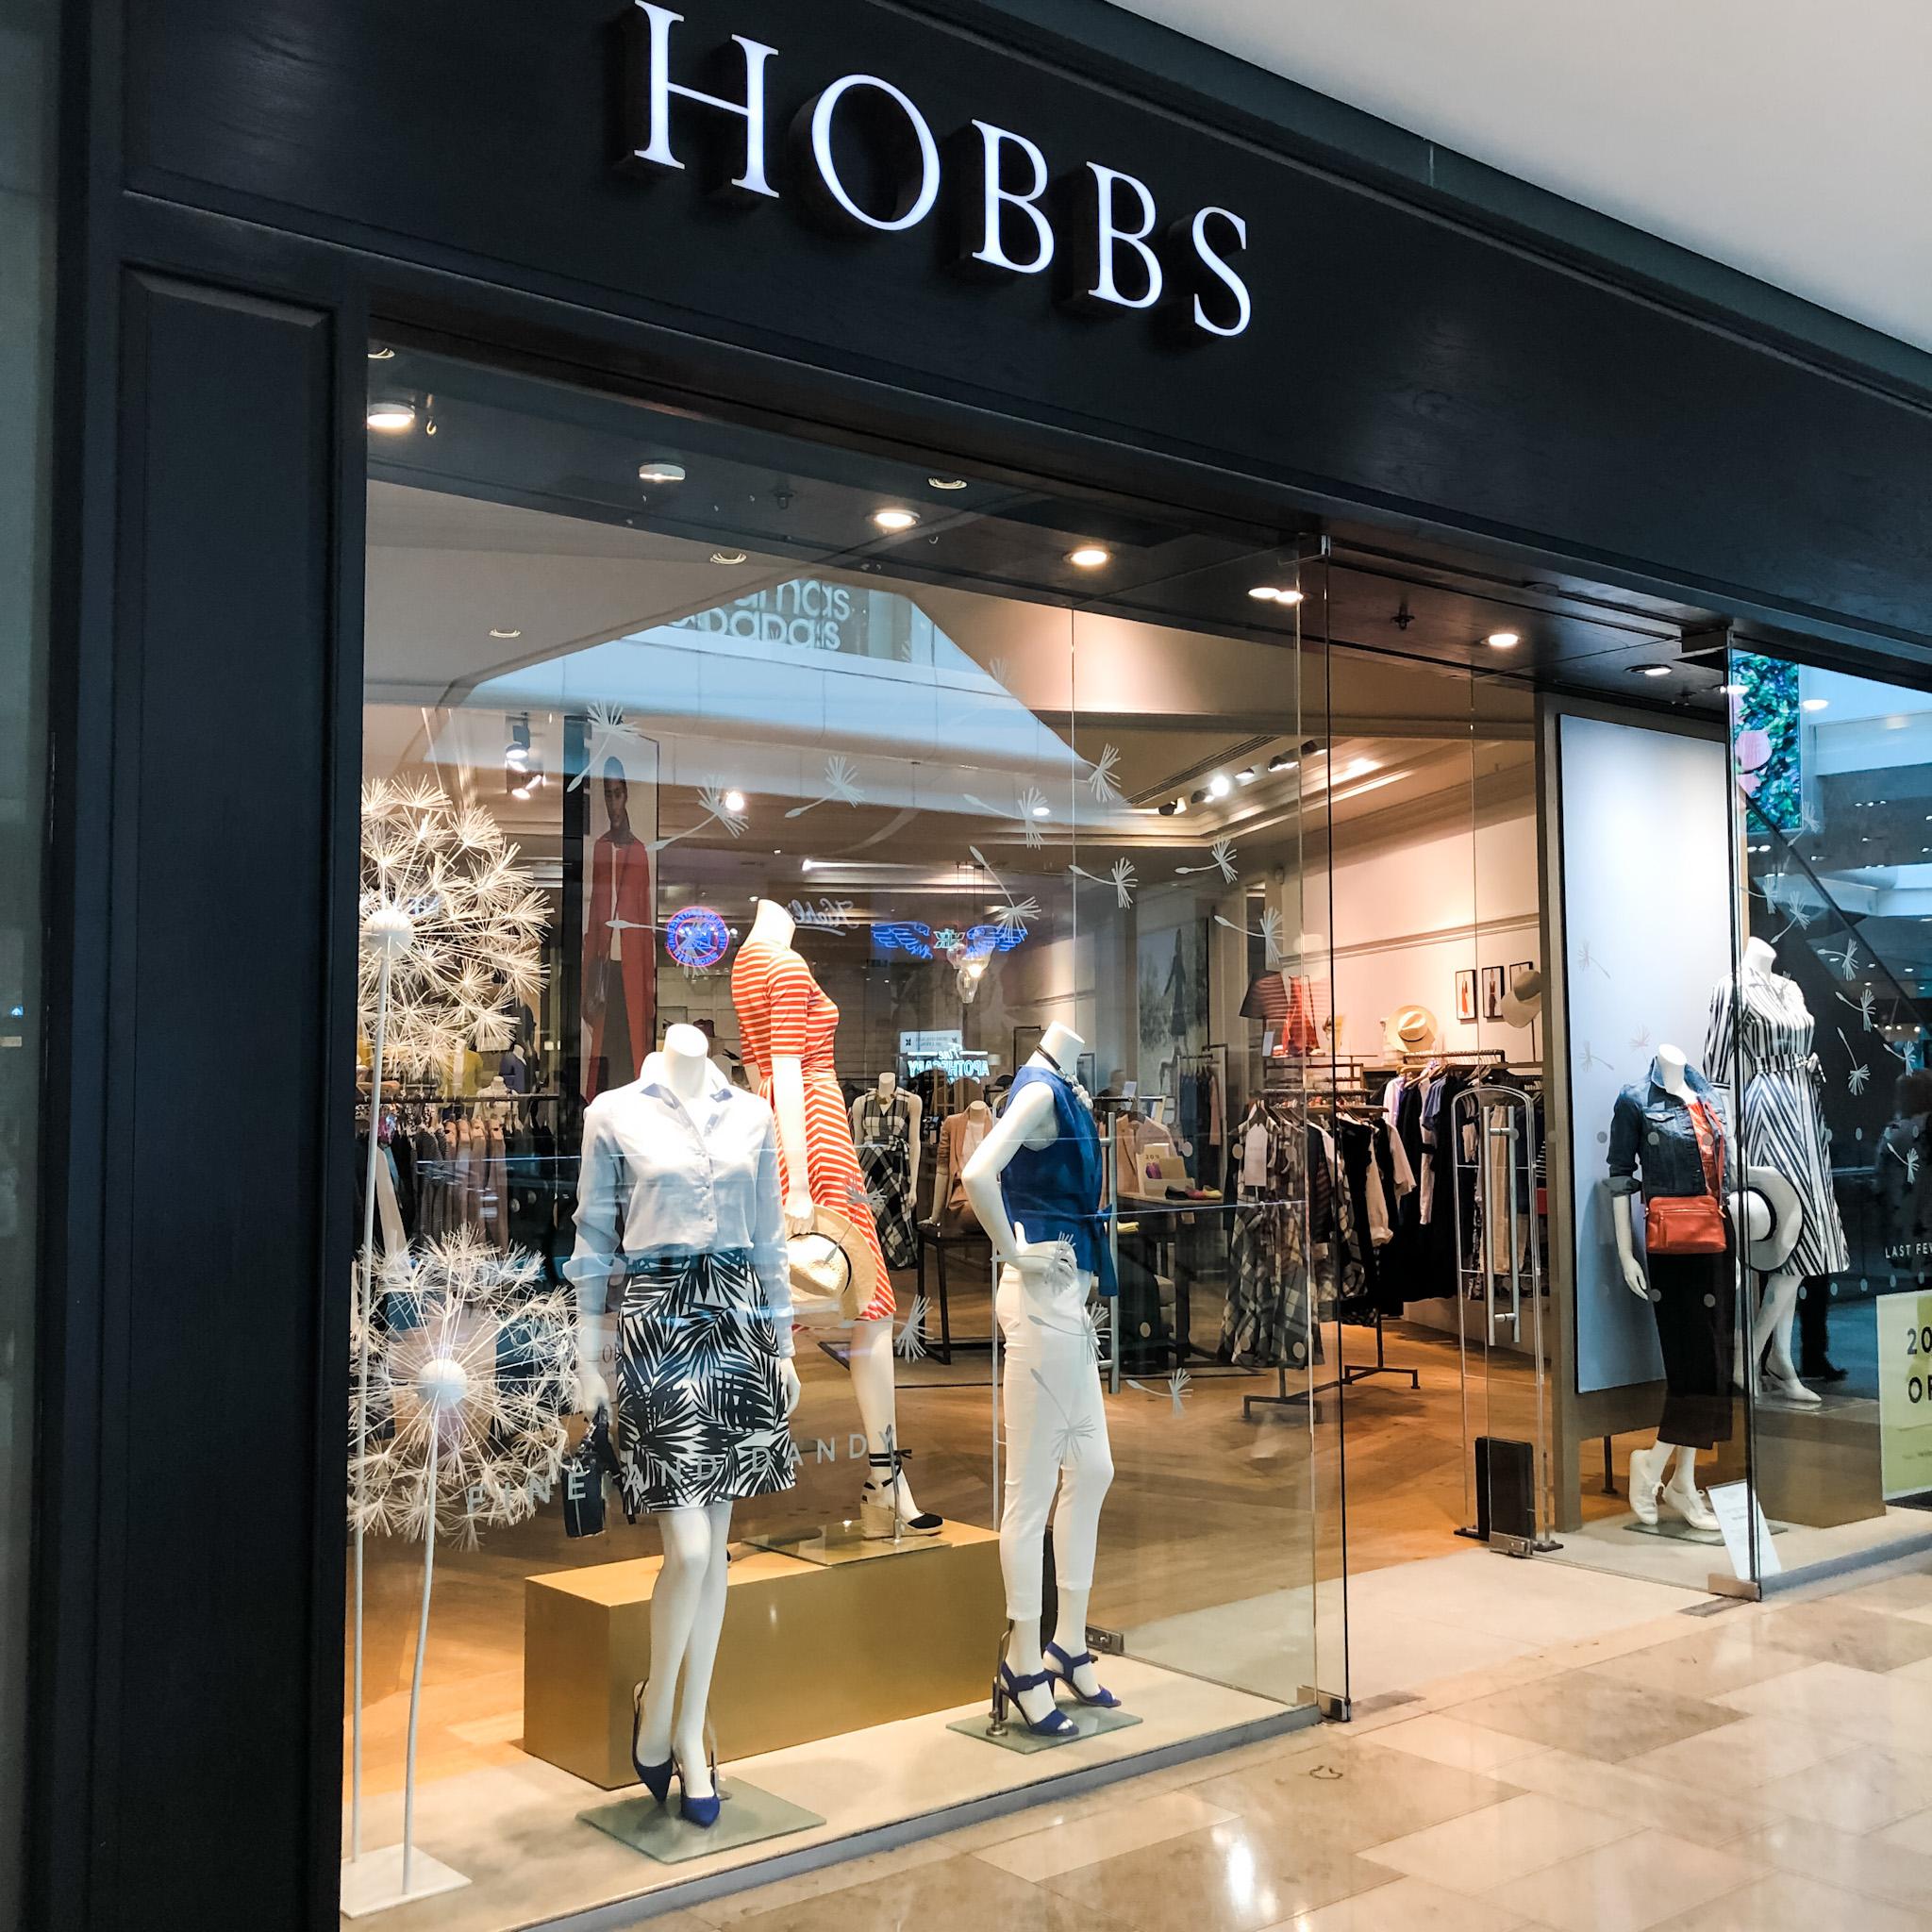 Hobbs window display